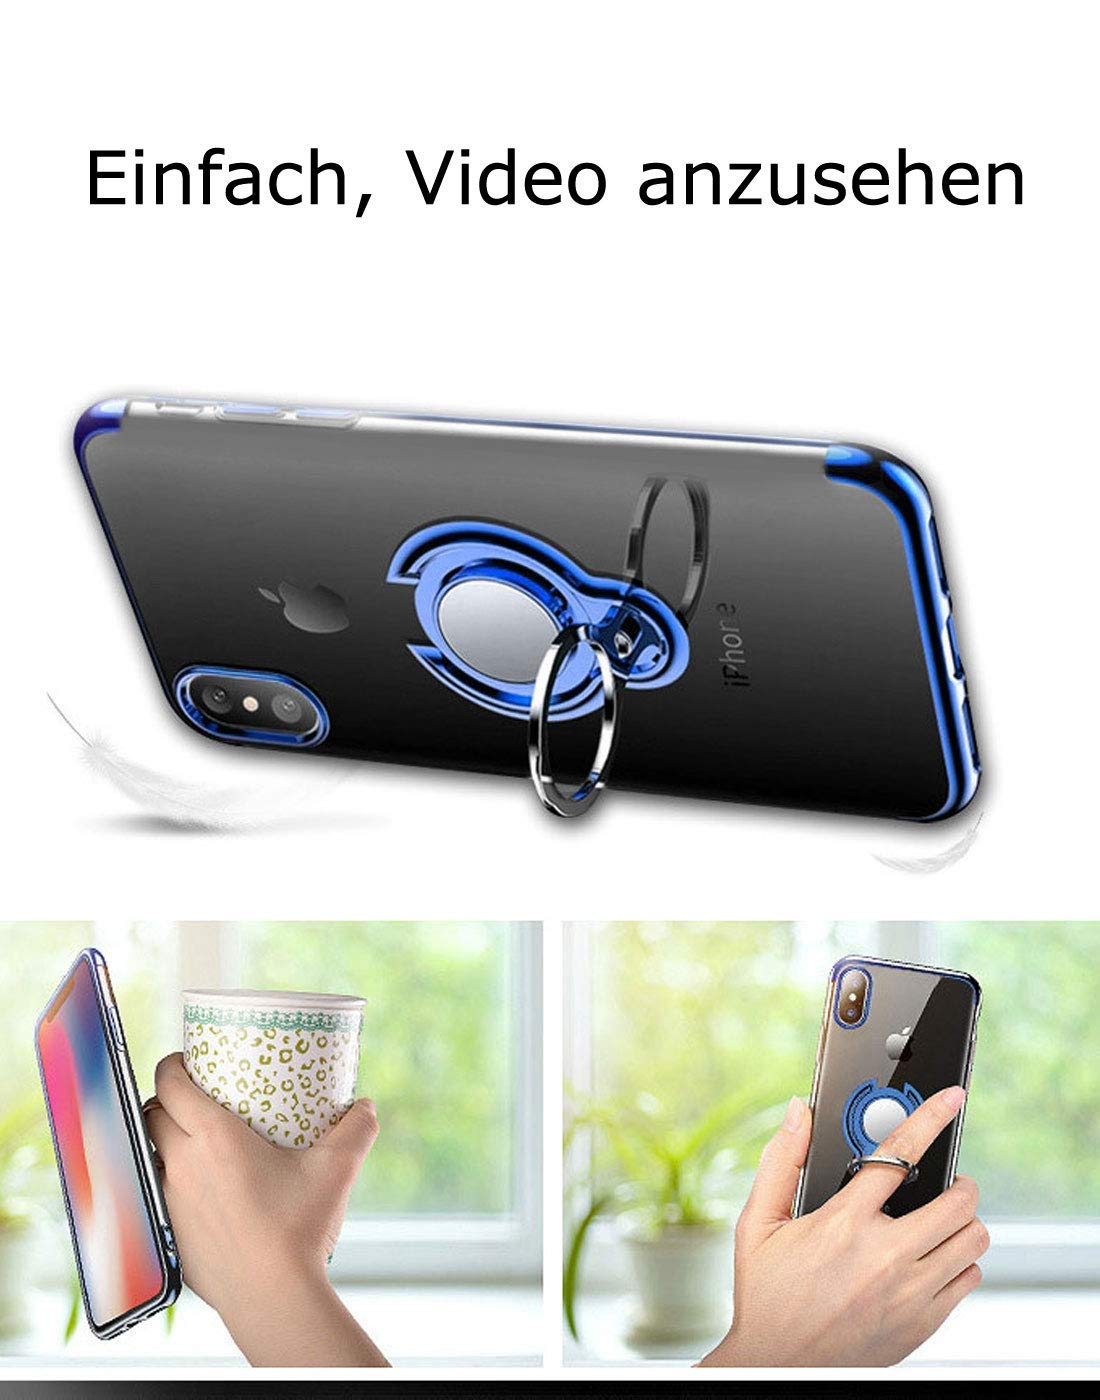 Caler H/ülle Kompatible Samsung Galaxy S9+//S9 Plus Handyh/ülle Soft Silikon H/ülle Ultra D/ünn TPU Bumper Case 360 Grad Ring Stand Magnetische KFZ-Halterung Autohalterung Schutzh/ülle f/ür Transparent